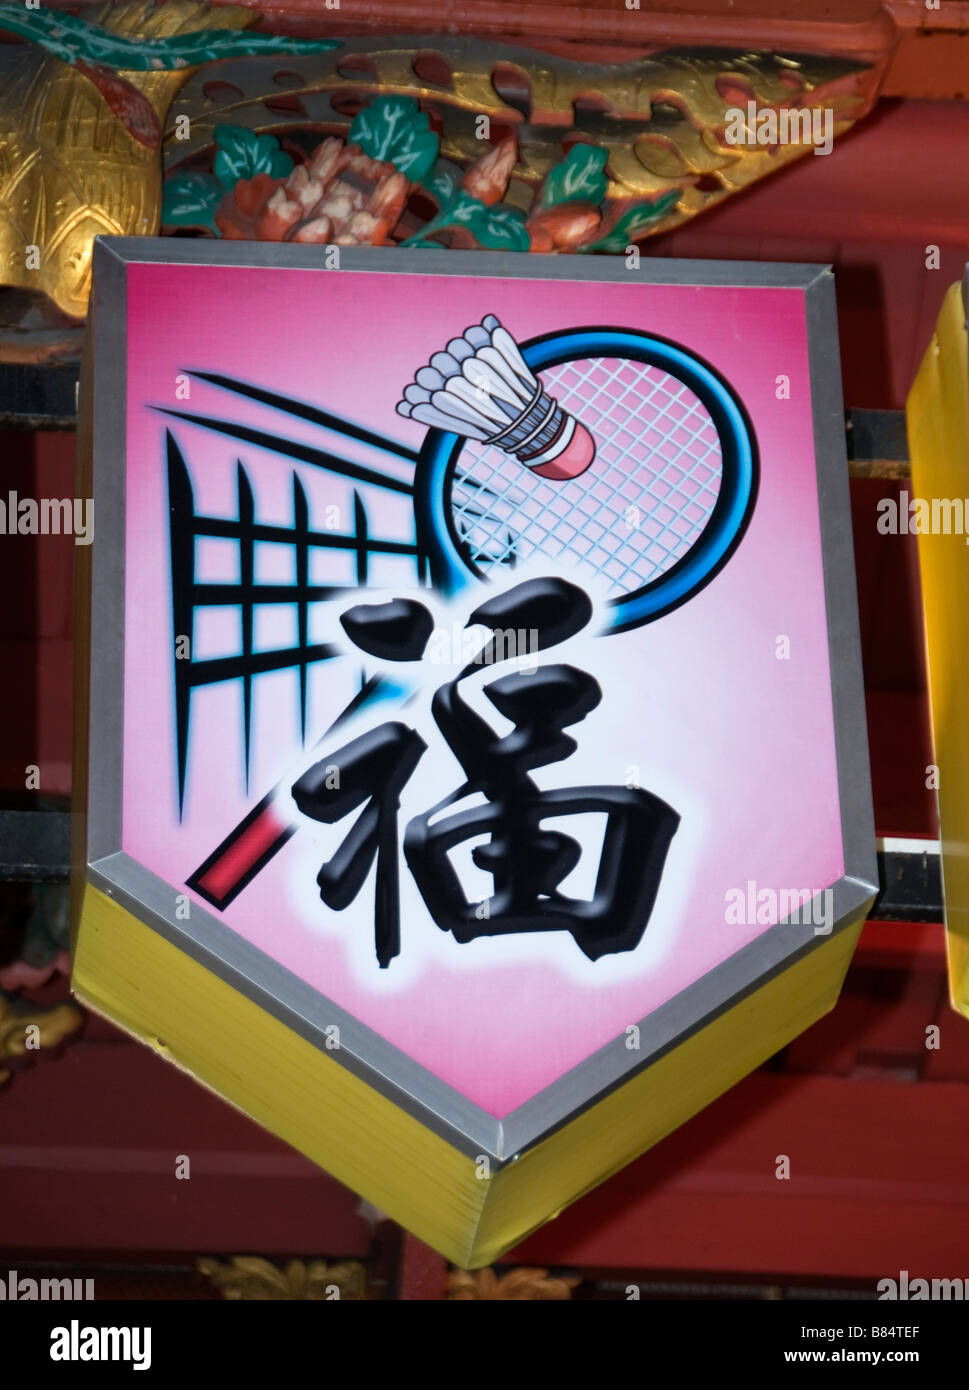 Malacca Malasia Chinatown China neón de luz giratoria deporte jugar un juego jugar al bádminton tenis Imagen De Stock